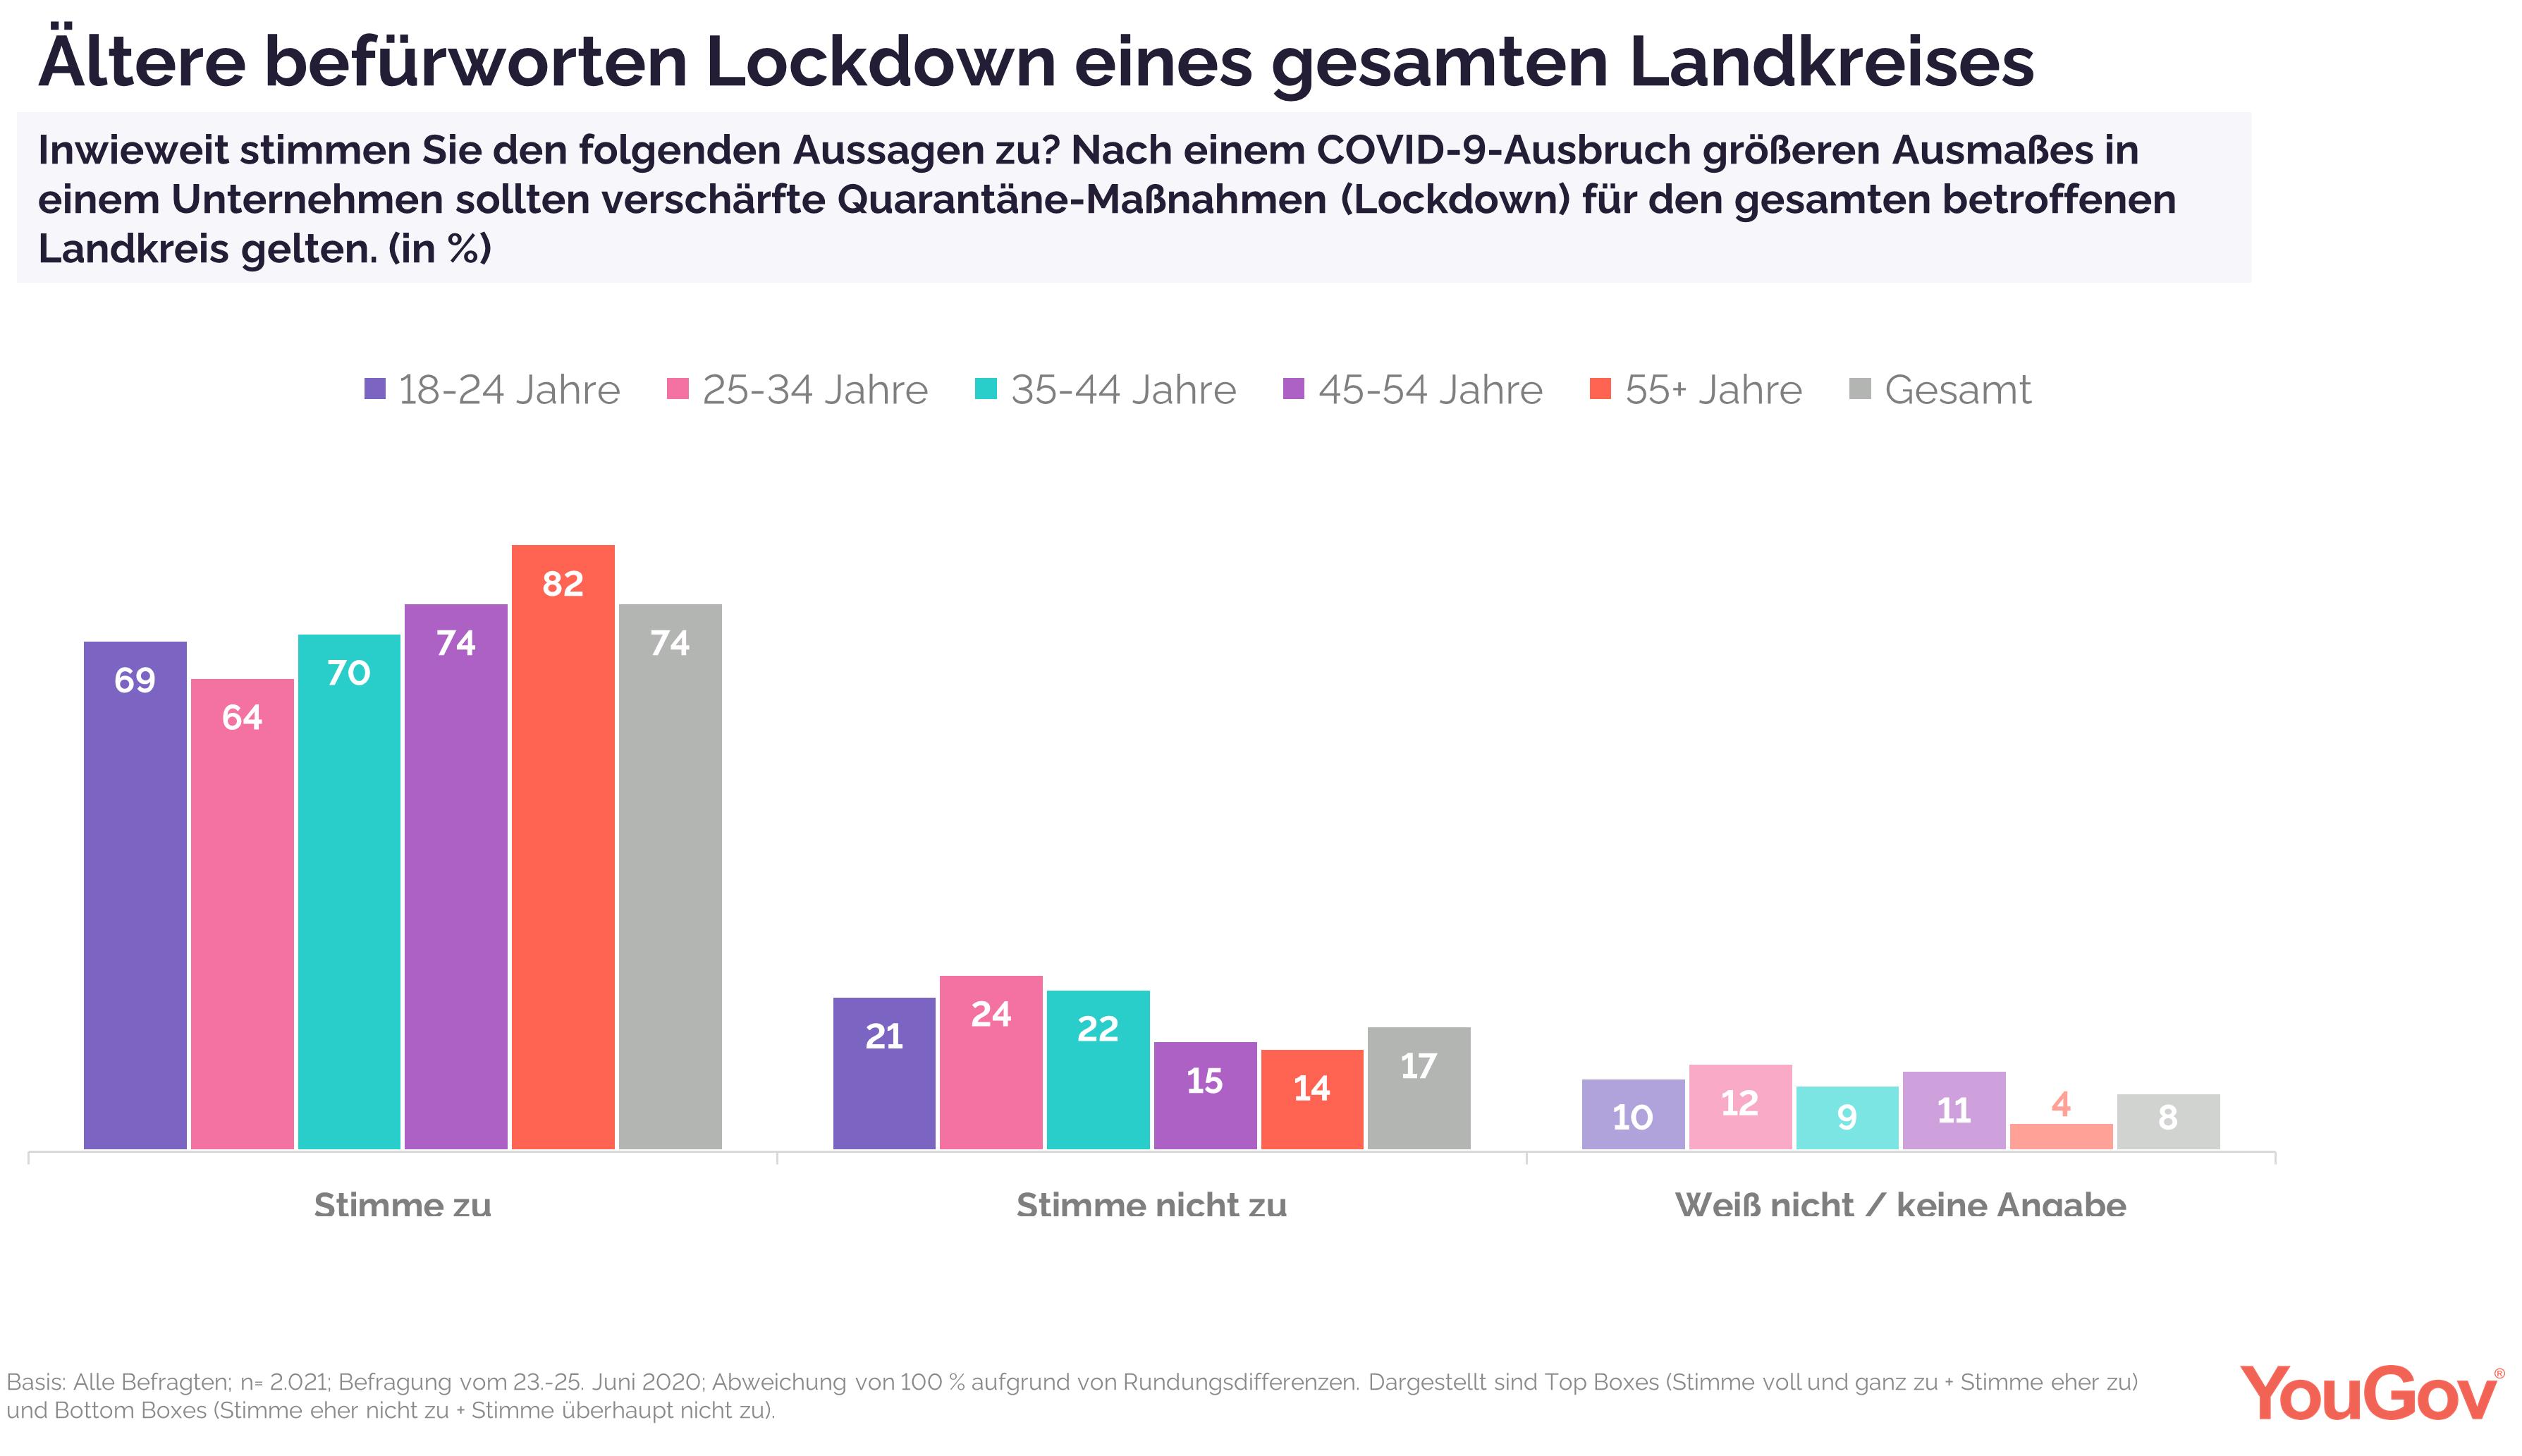 Lockdown im Landkreis